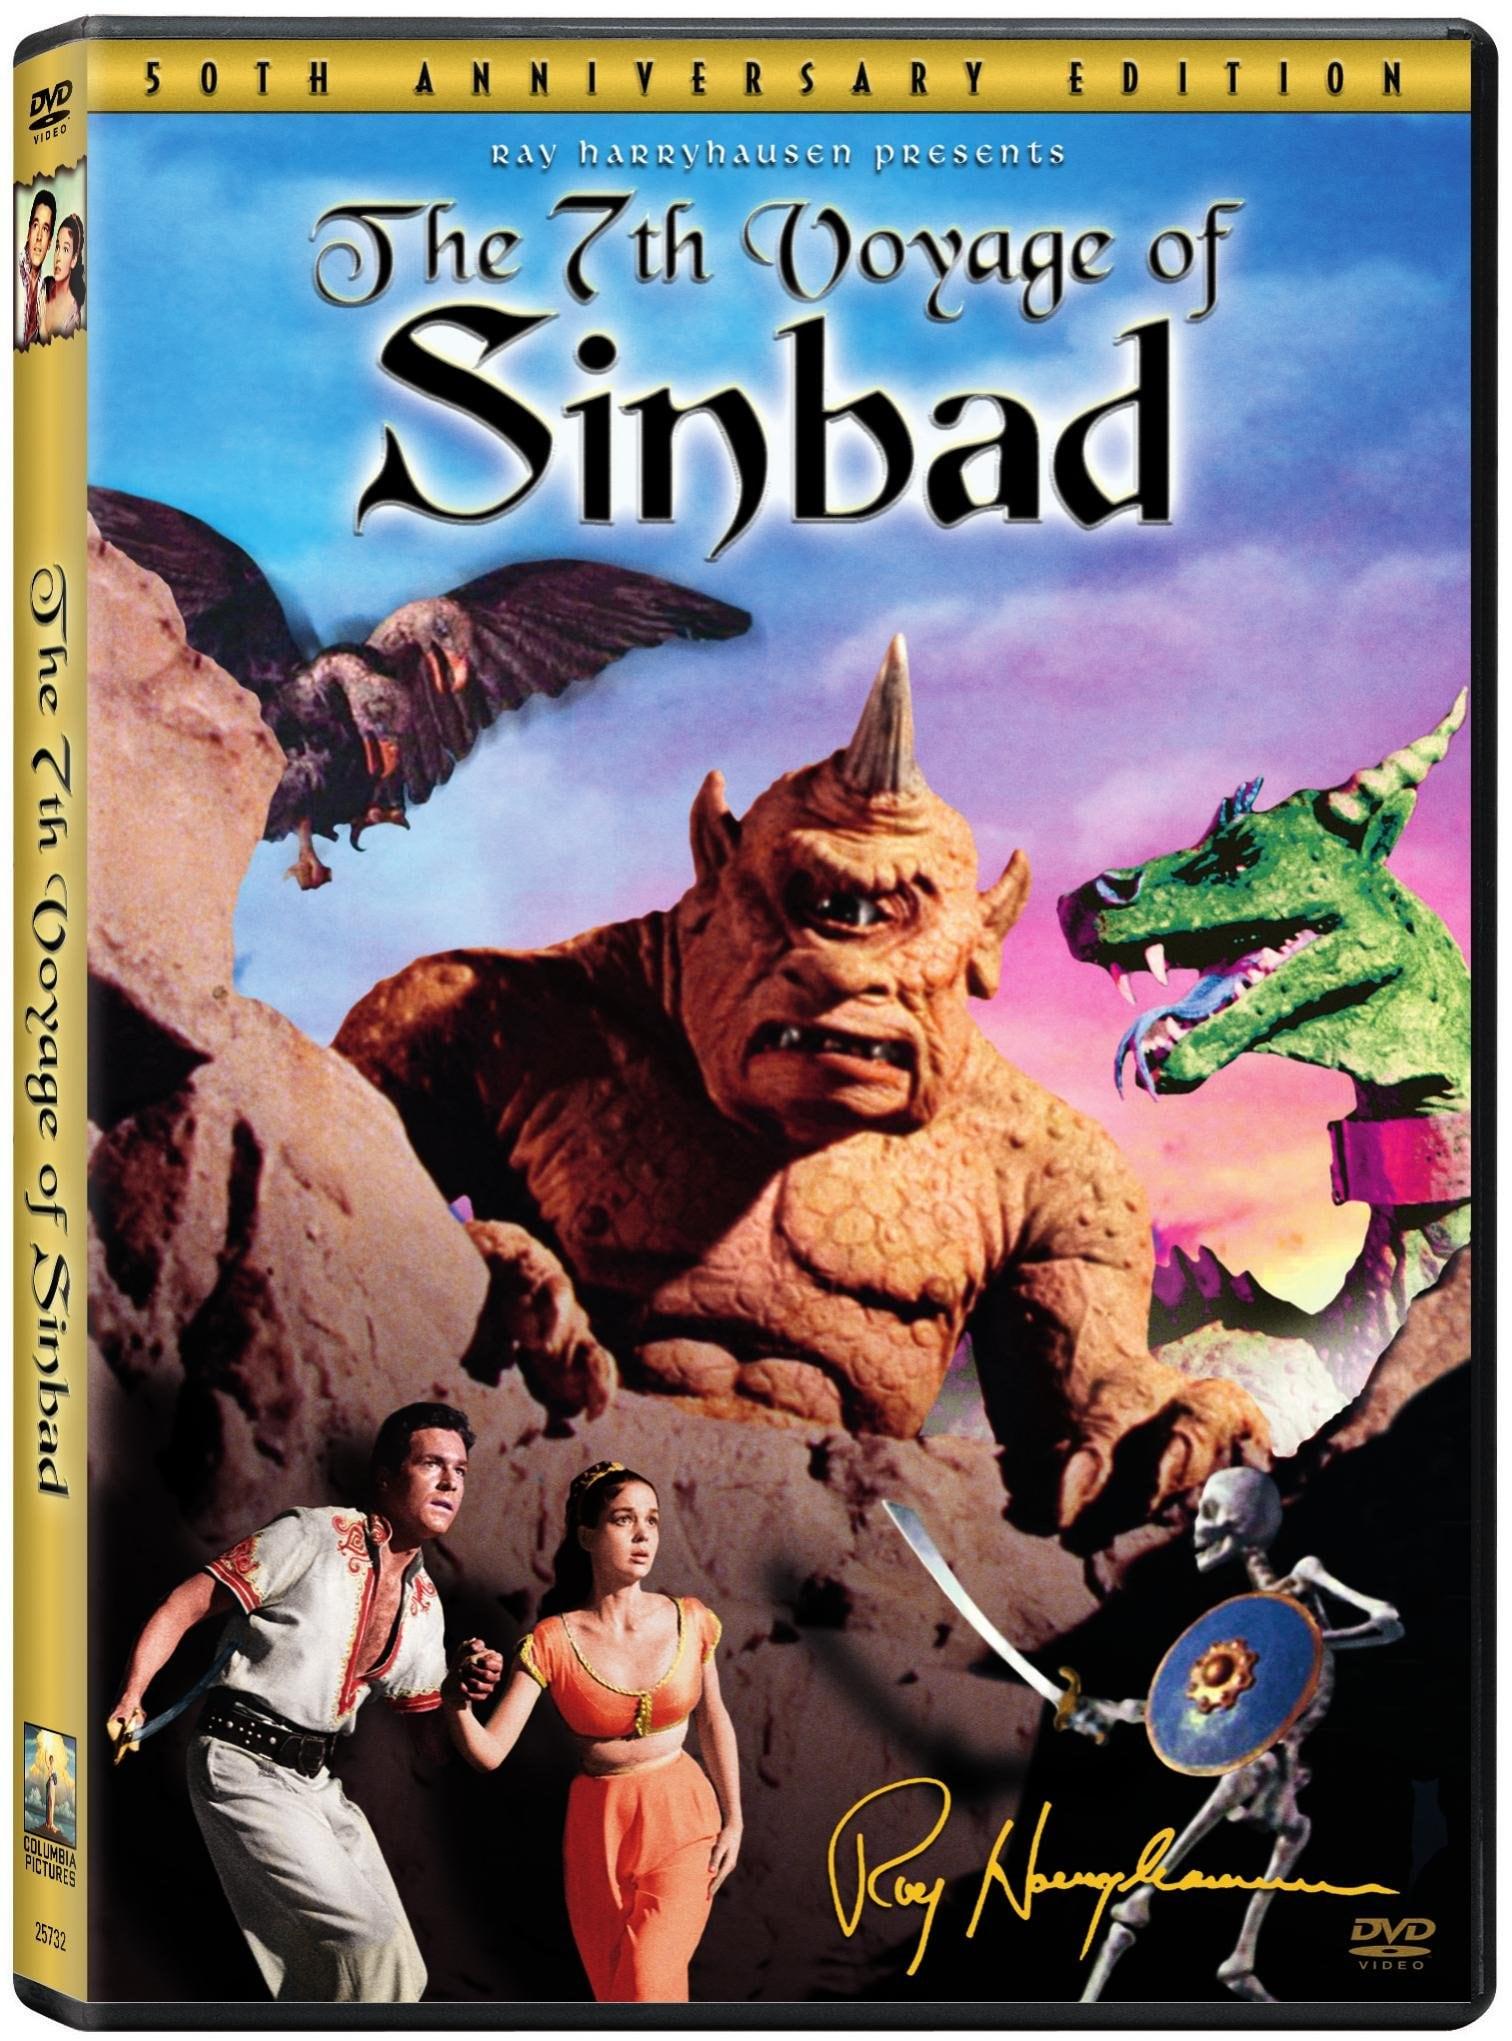 The 7th Voyage of Sinbad: 50th Anniversary Edition (DVD)